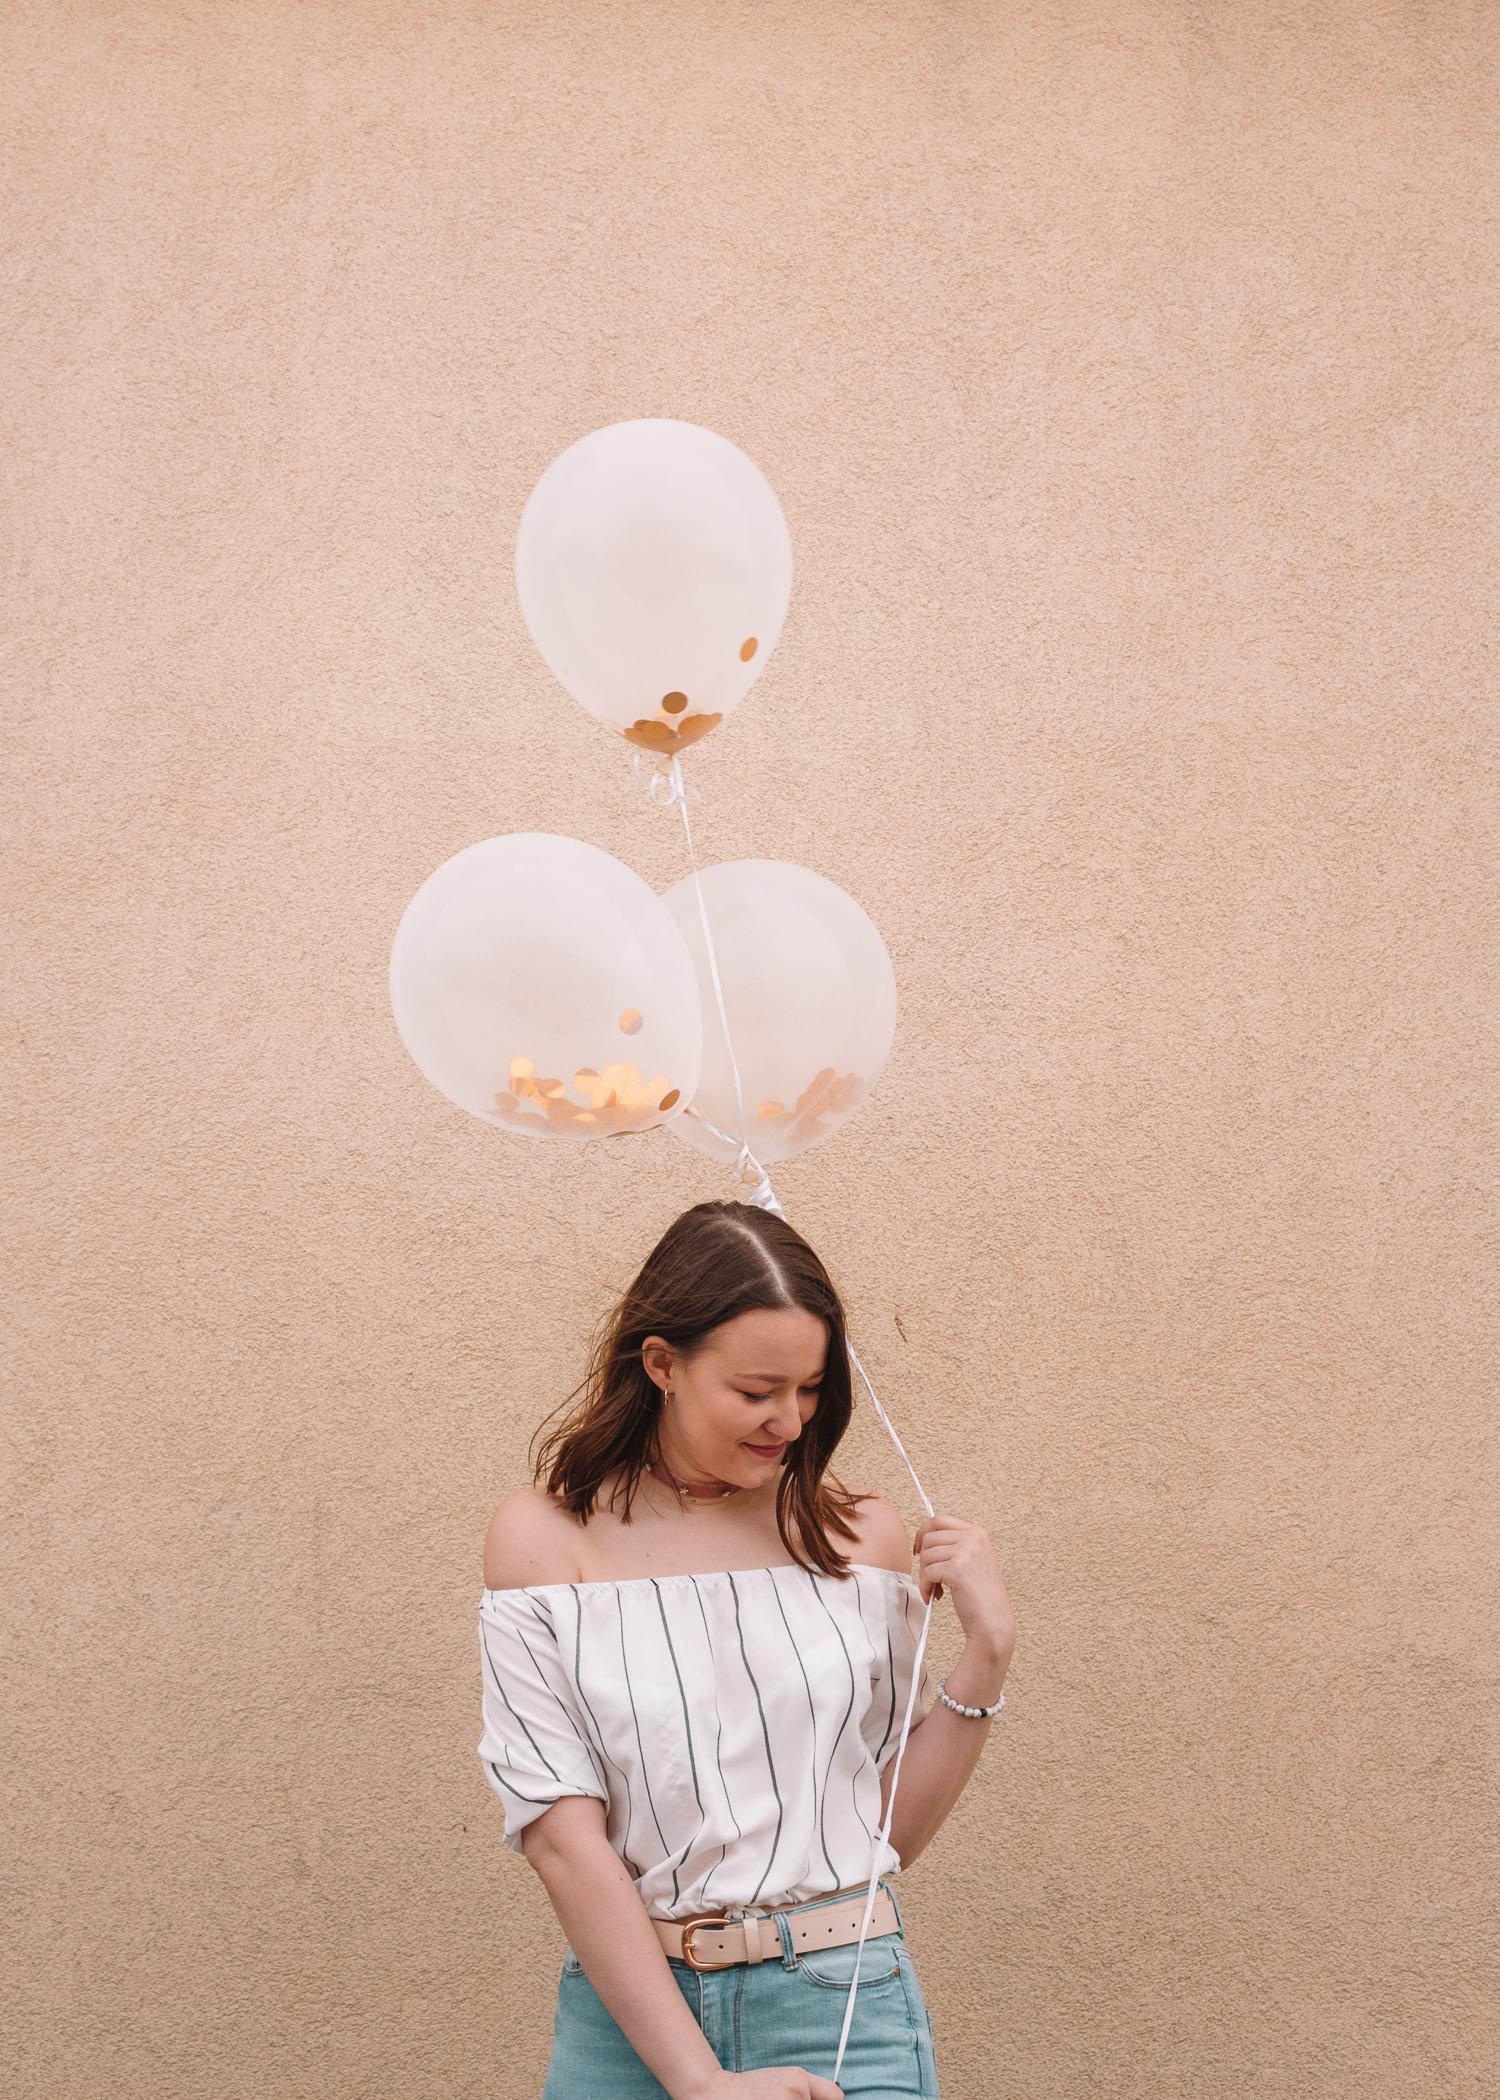 balloon birthday girl